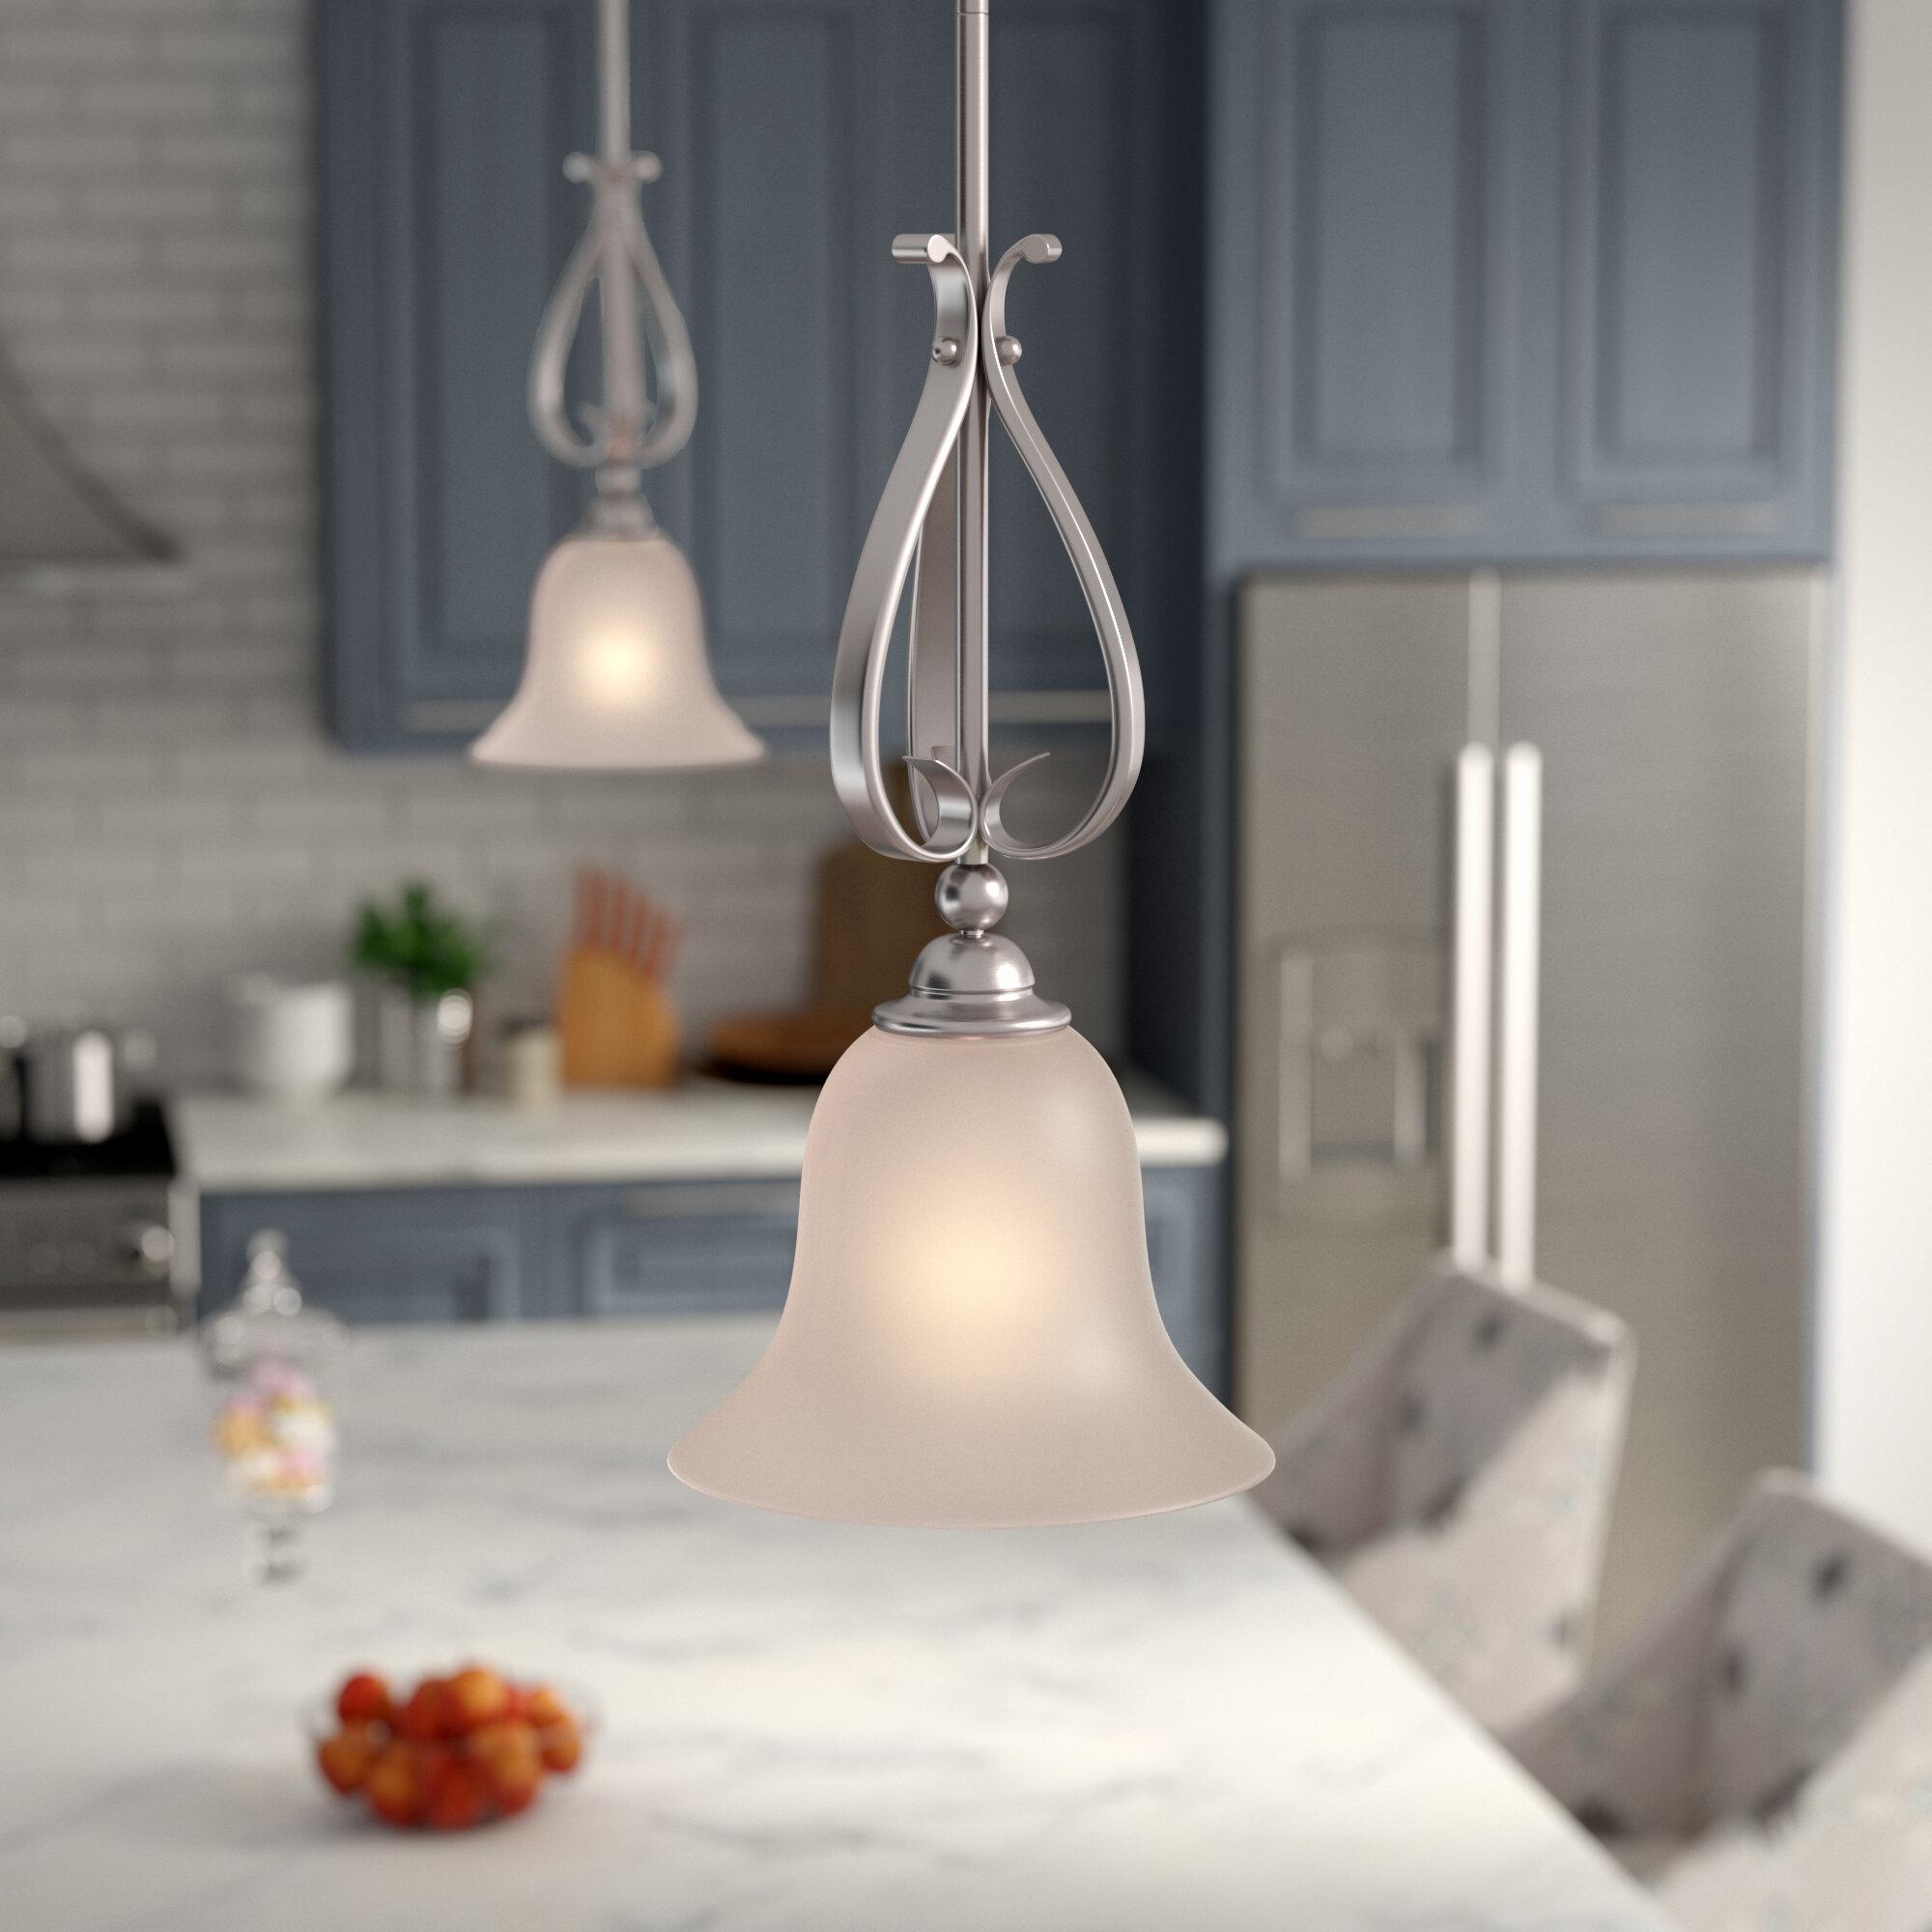 Andover Mills Macalla 1 Light Single Bell Pendant Reviews Wayfair